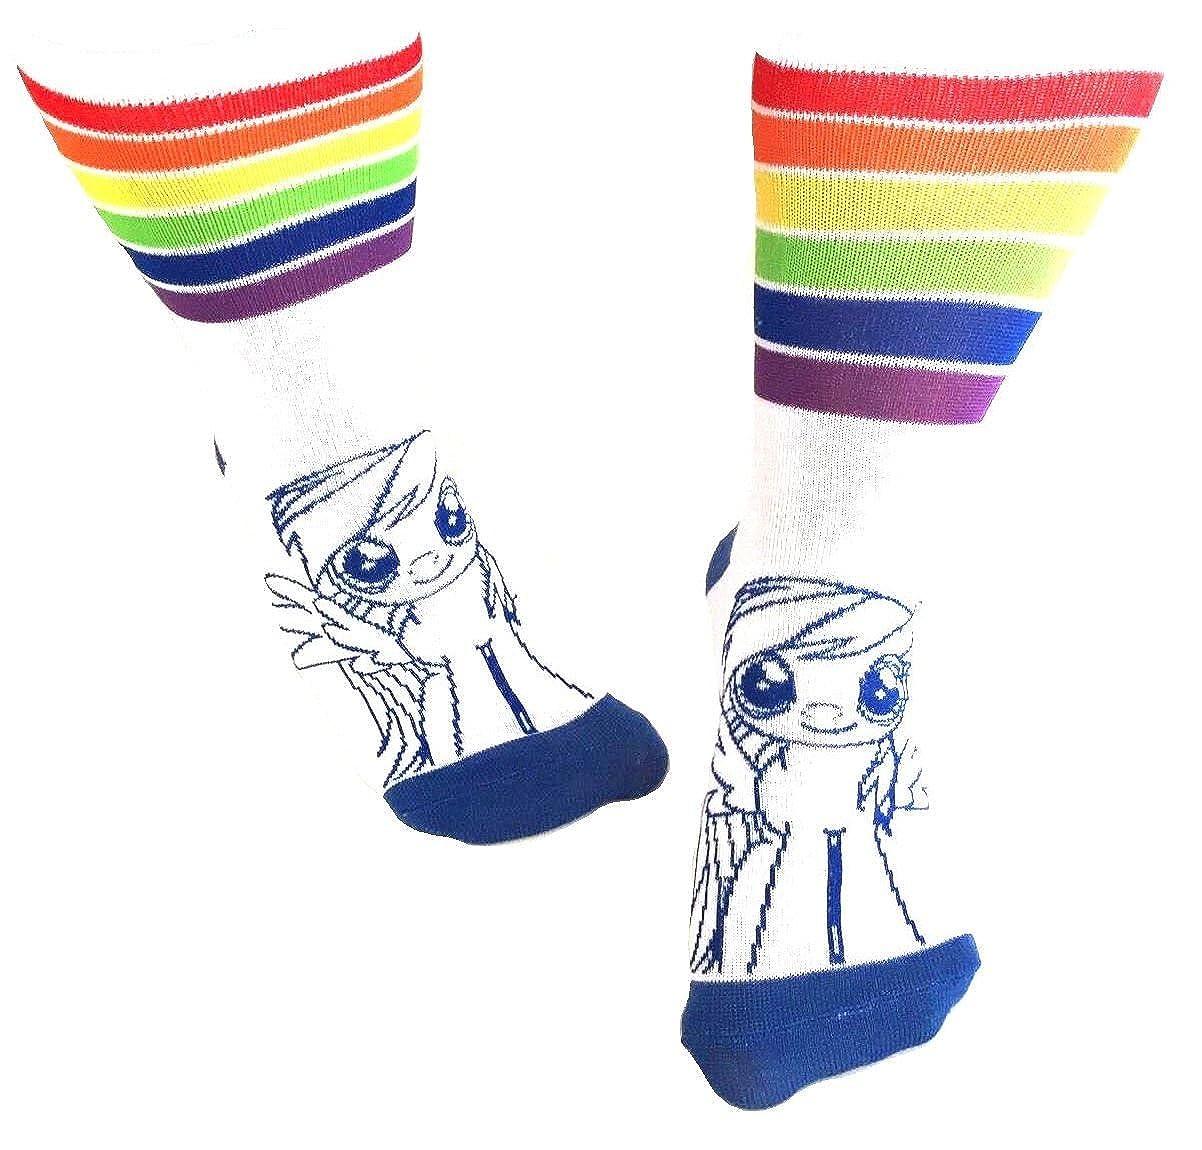 My Little Pony Rainbow Dash Striped Juniors Cartoon Crew Socks Sock Size: 9-11, Fits Shoe Size: 5-10